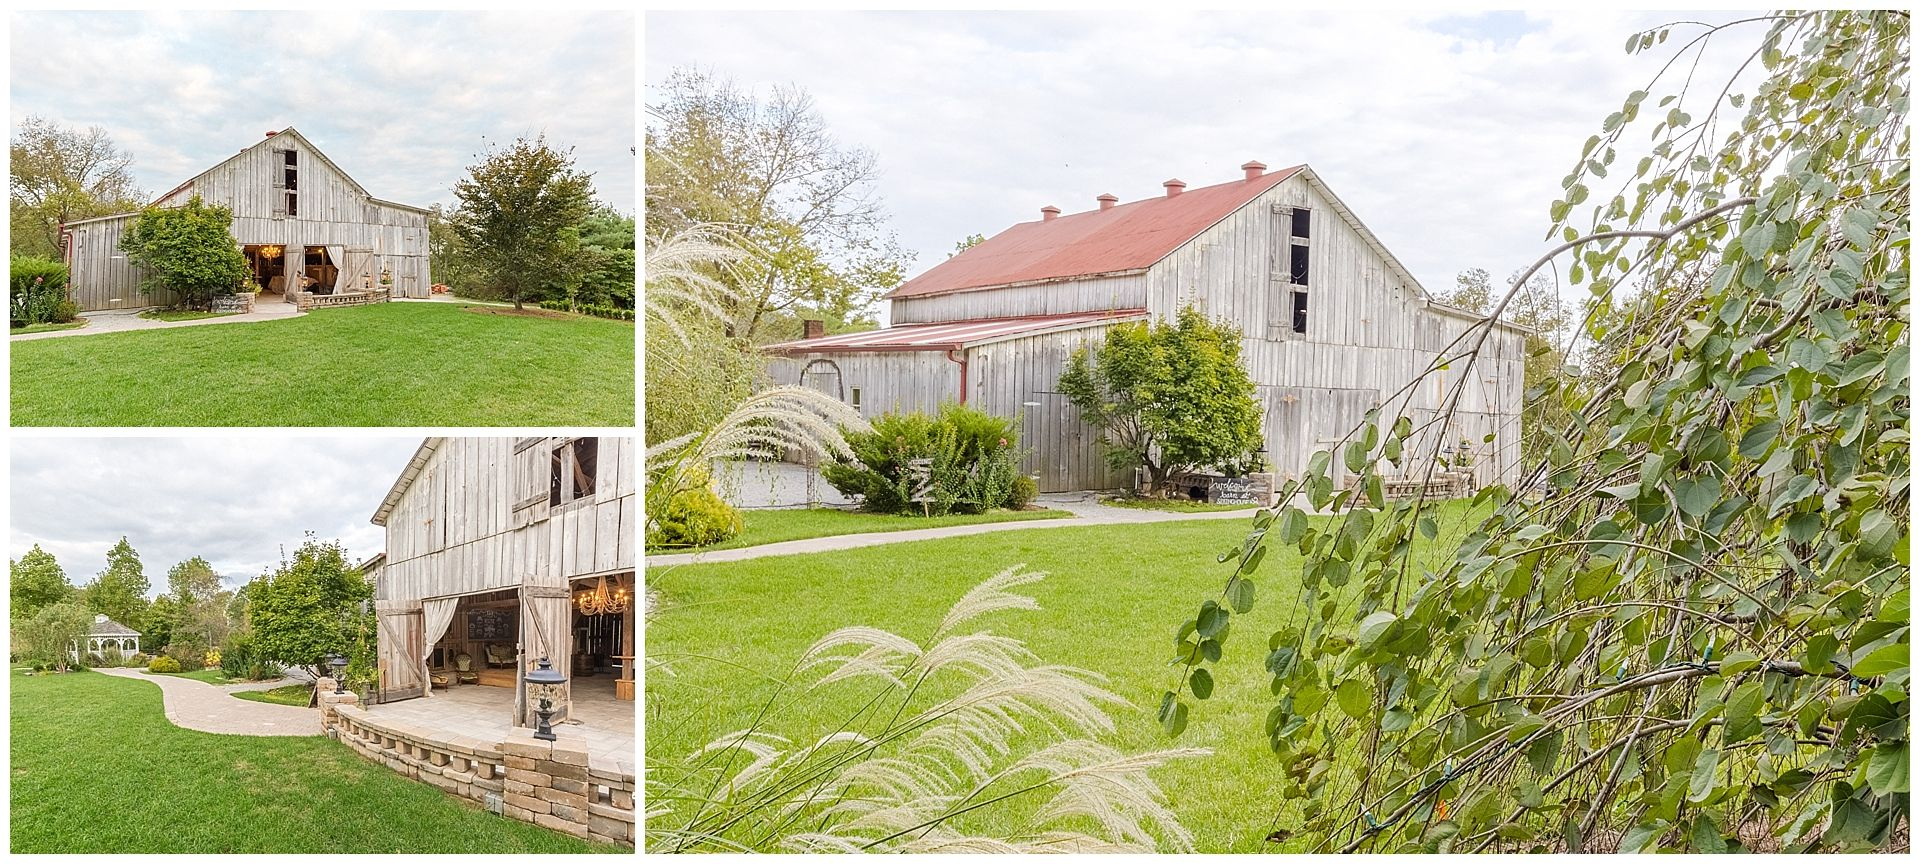 The Barn At Springhouse Gardens Wedding Venue In Nicholasville Ky Kentucky